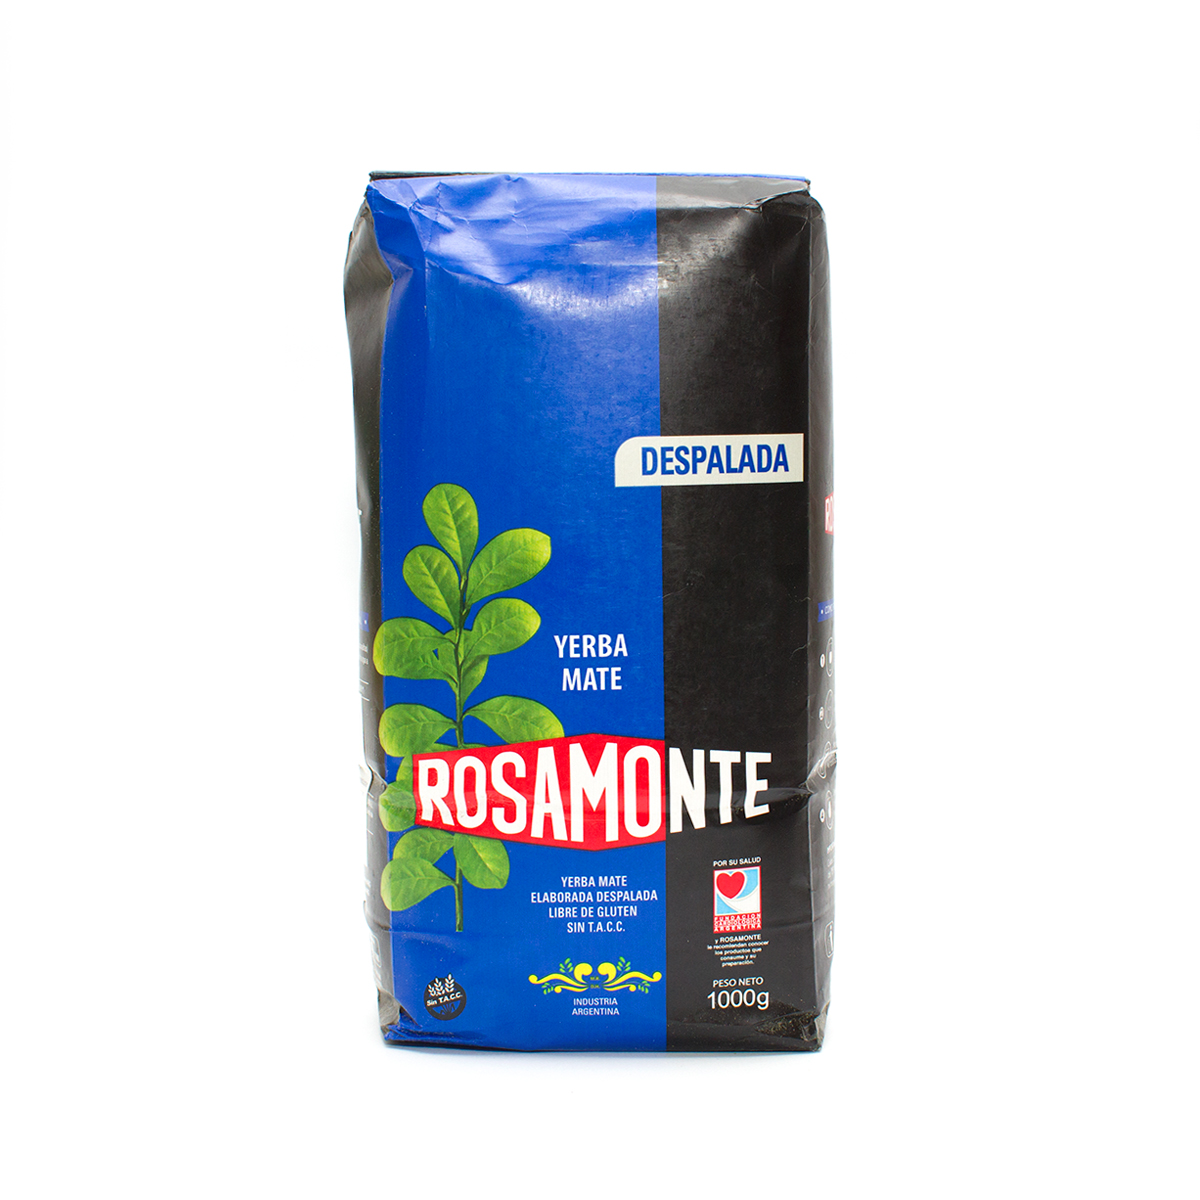 Мате Rosamonte Despalada, 1000 г мате rosamonte despalada 500 г